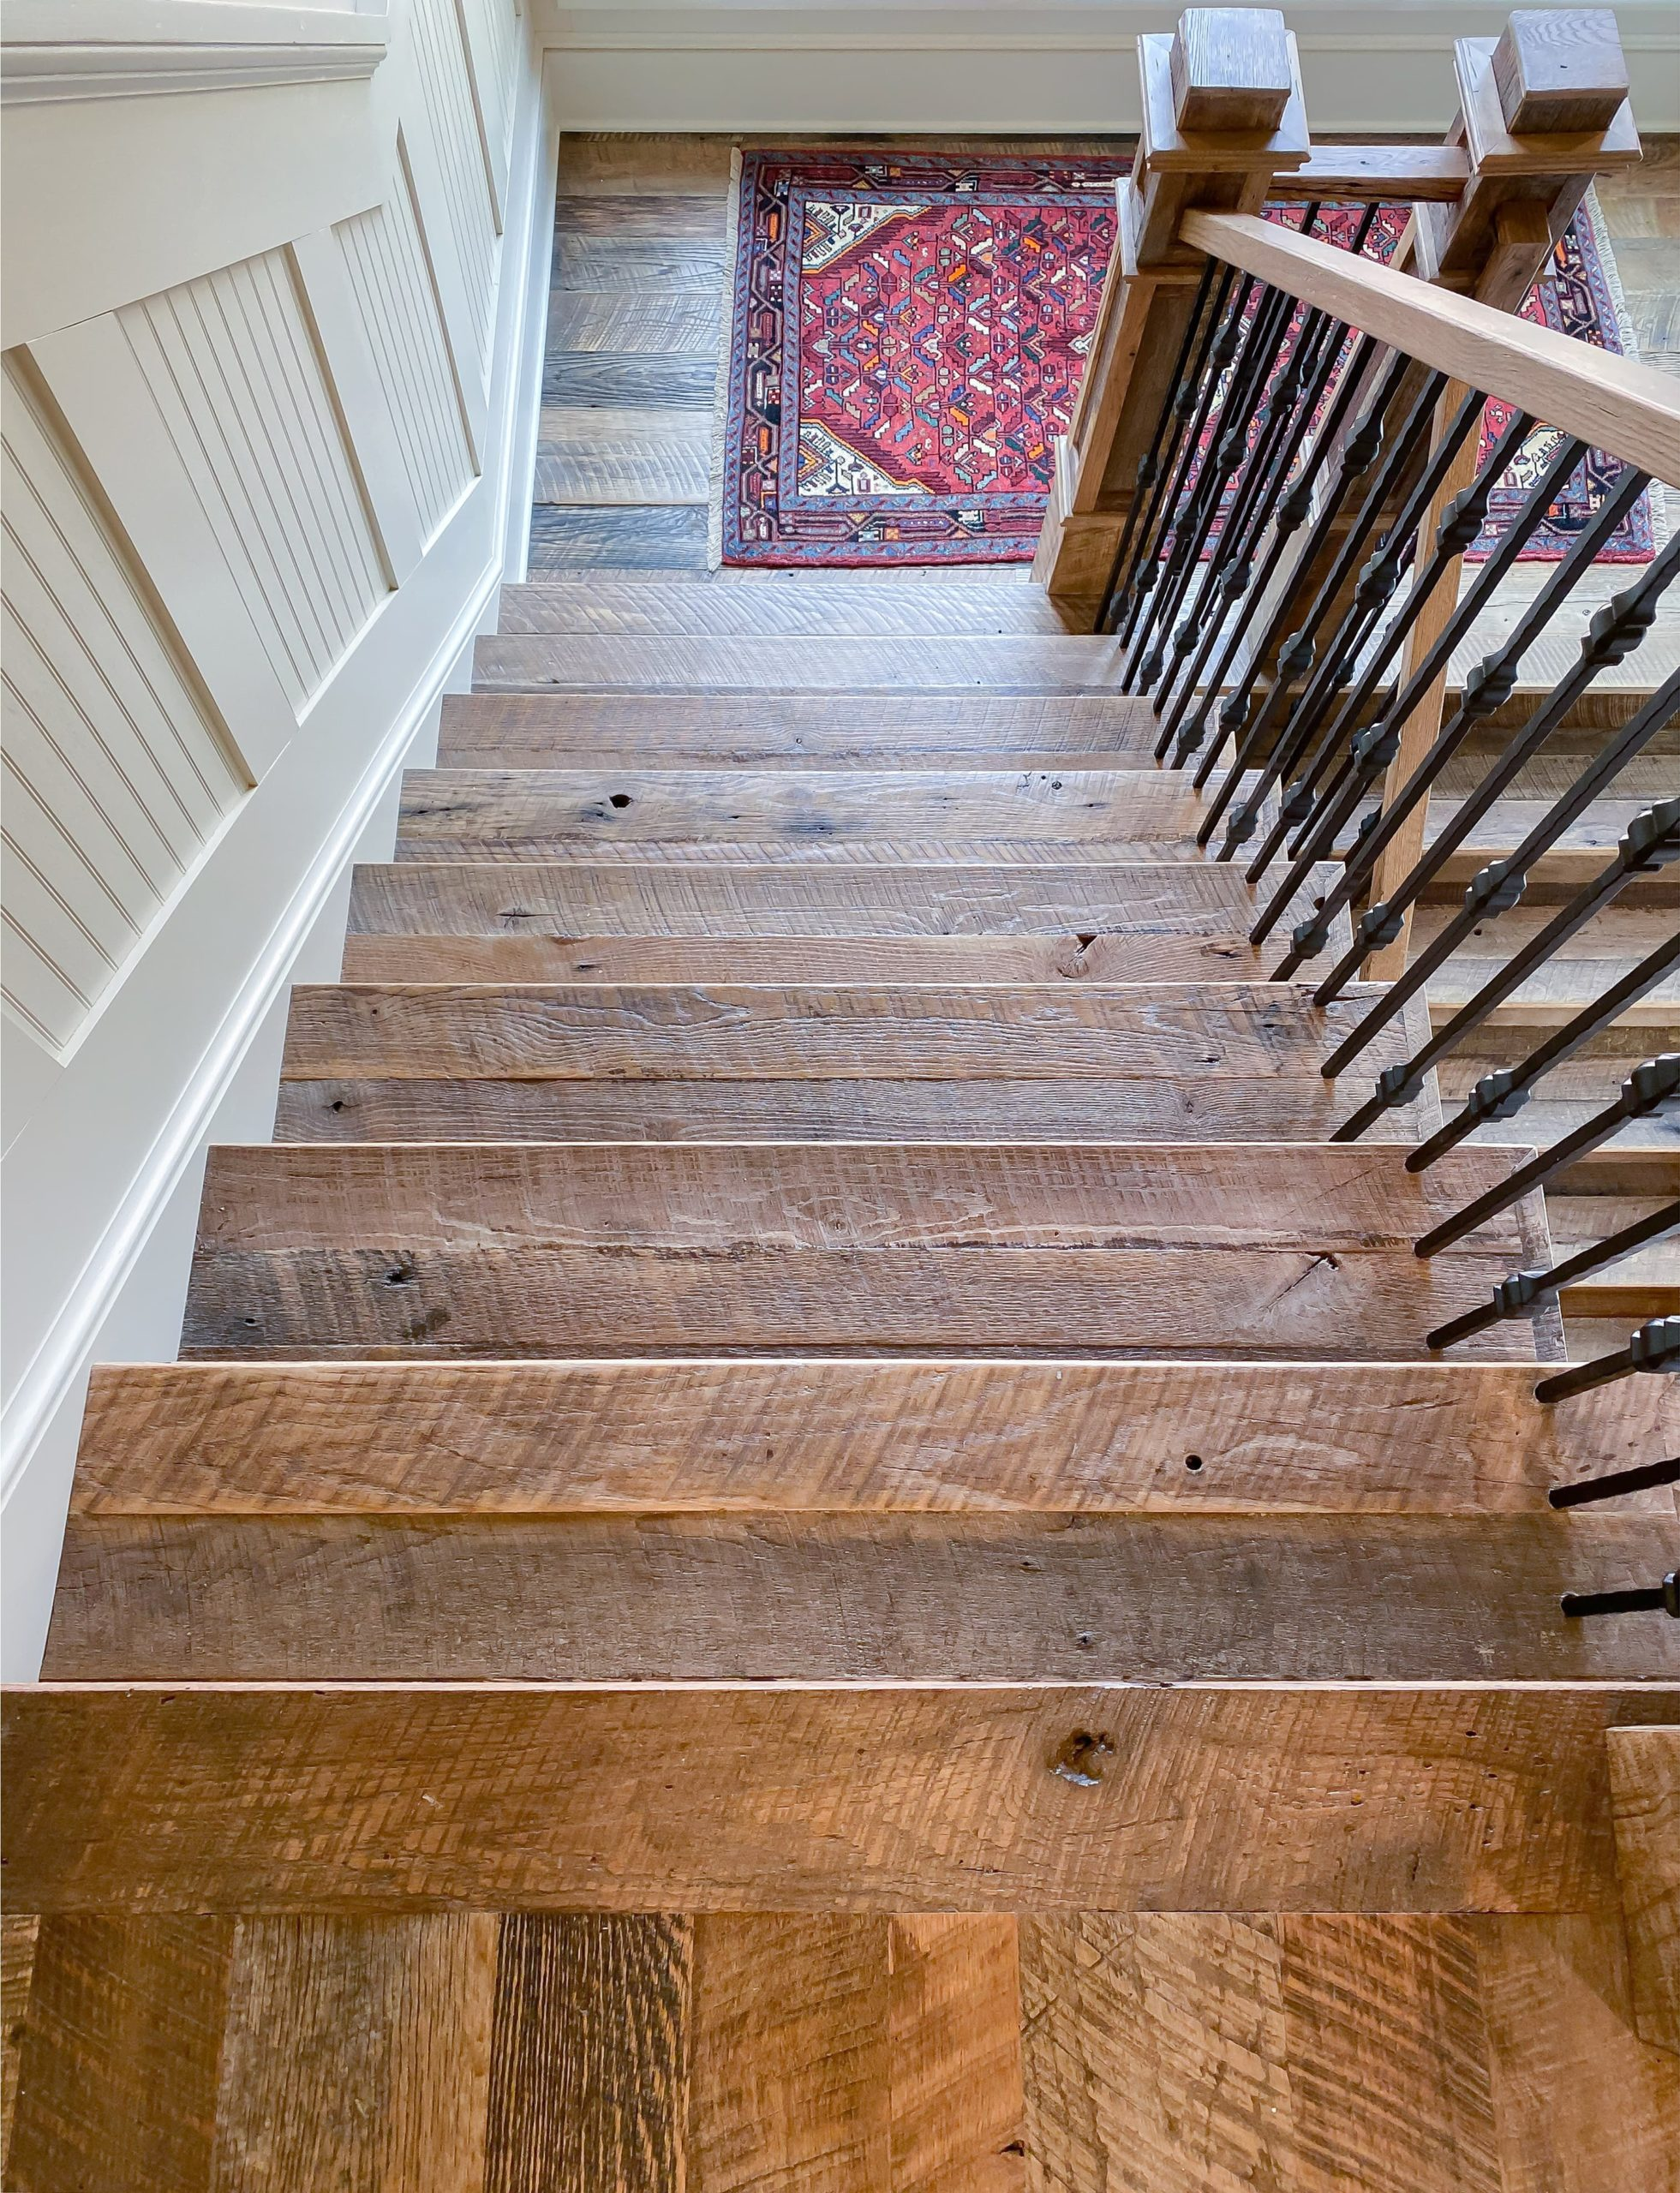 Antique Reclaimed Original Face Oak Stair Parts | Treads, Risers, Newel Posts